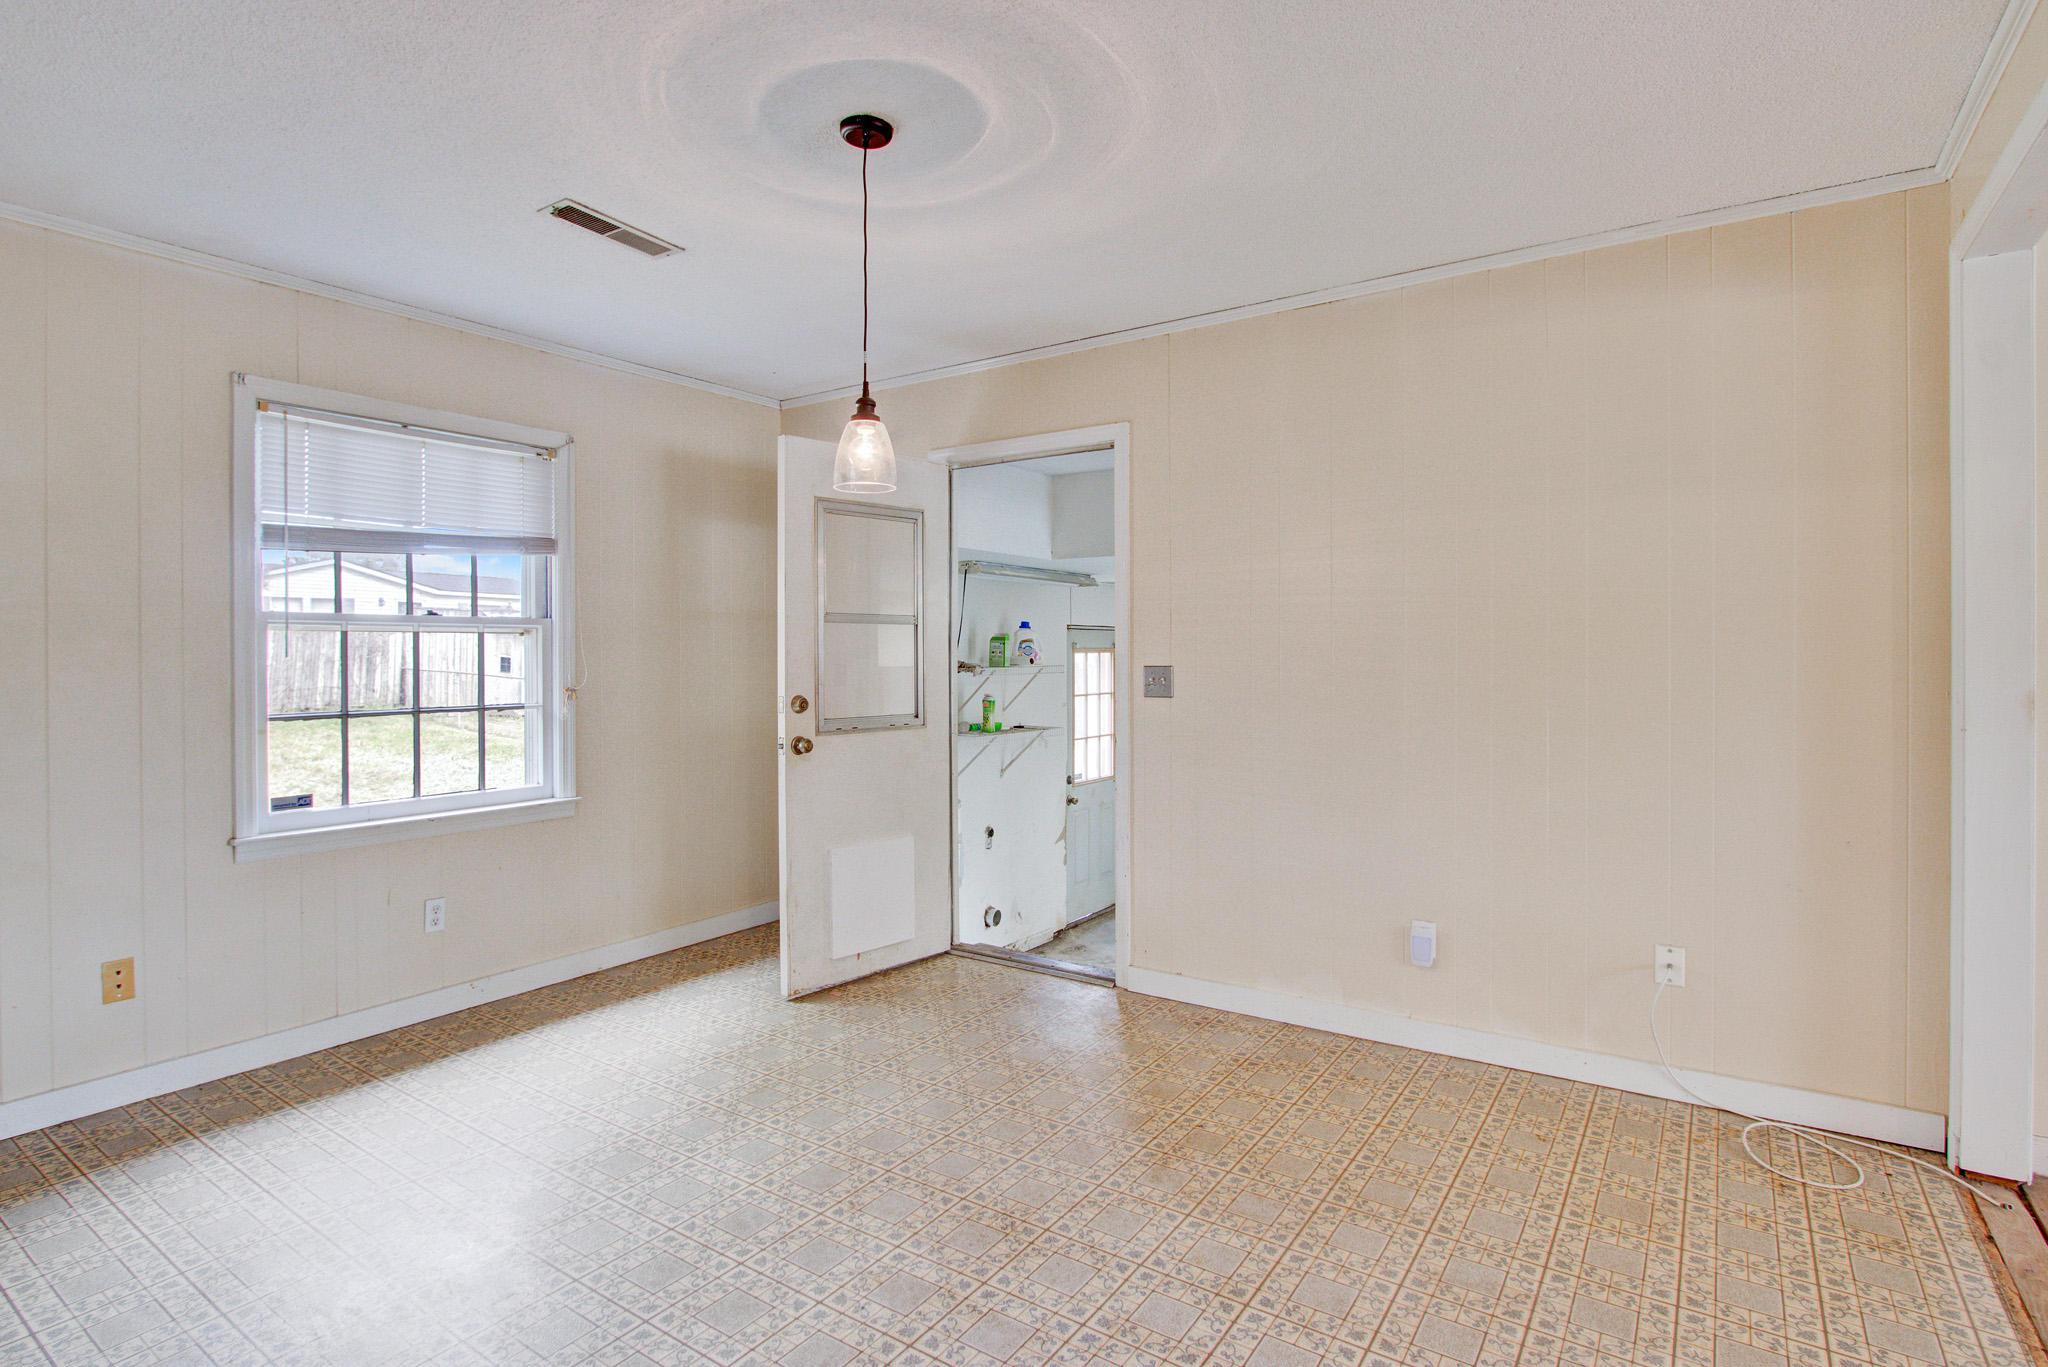 Bushy Park Terrace Homes For Sale - 125 Azalea, Goose Creek, SC - 17